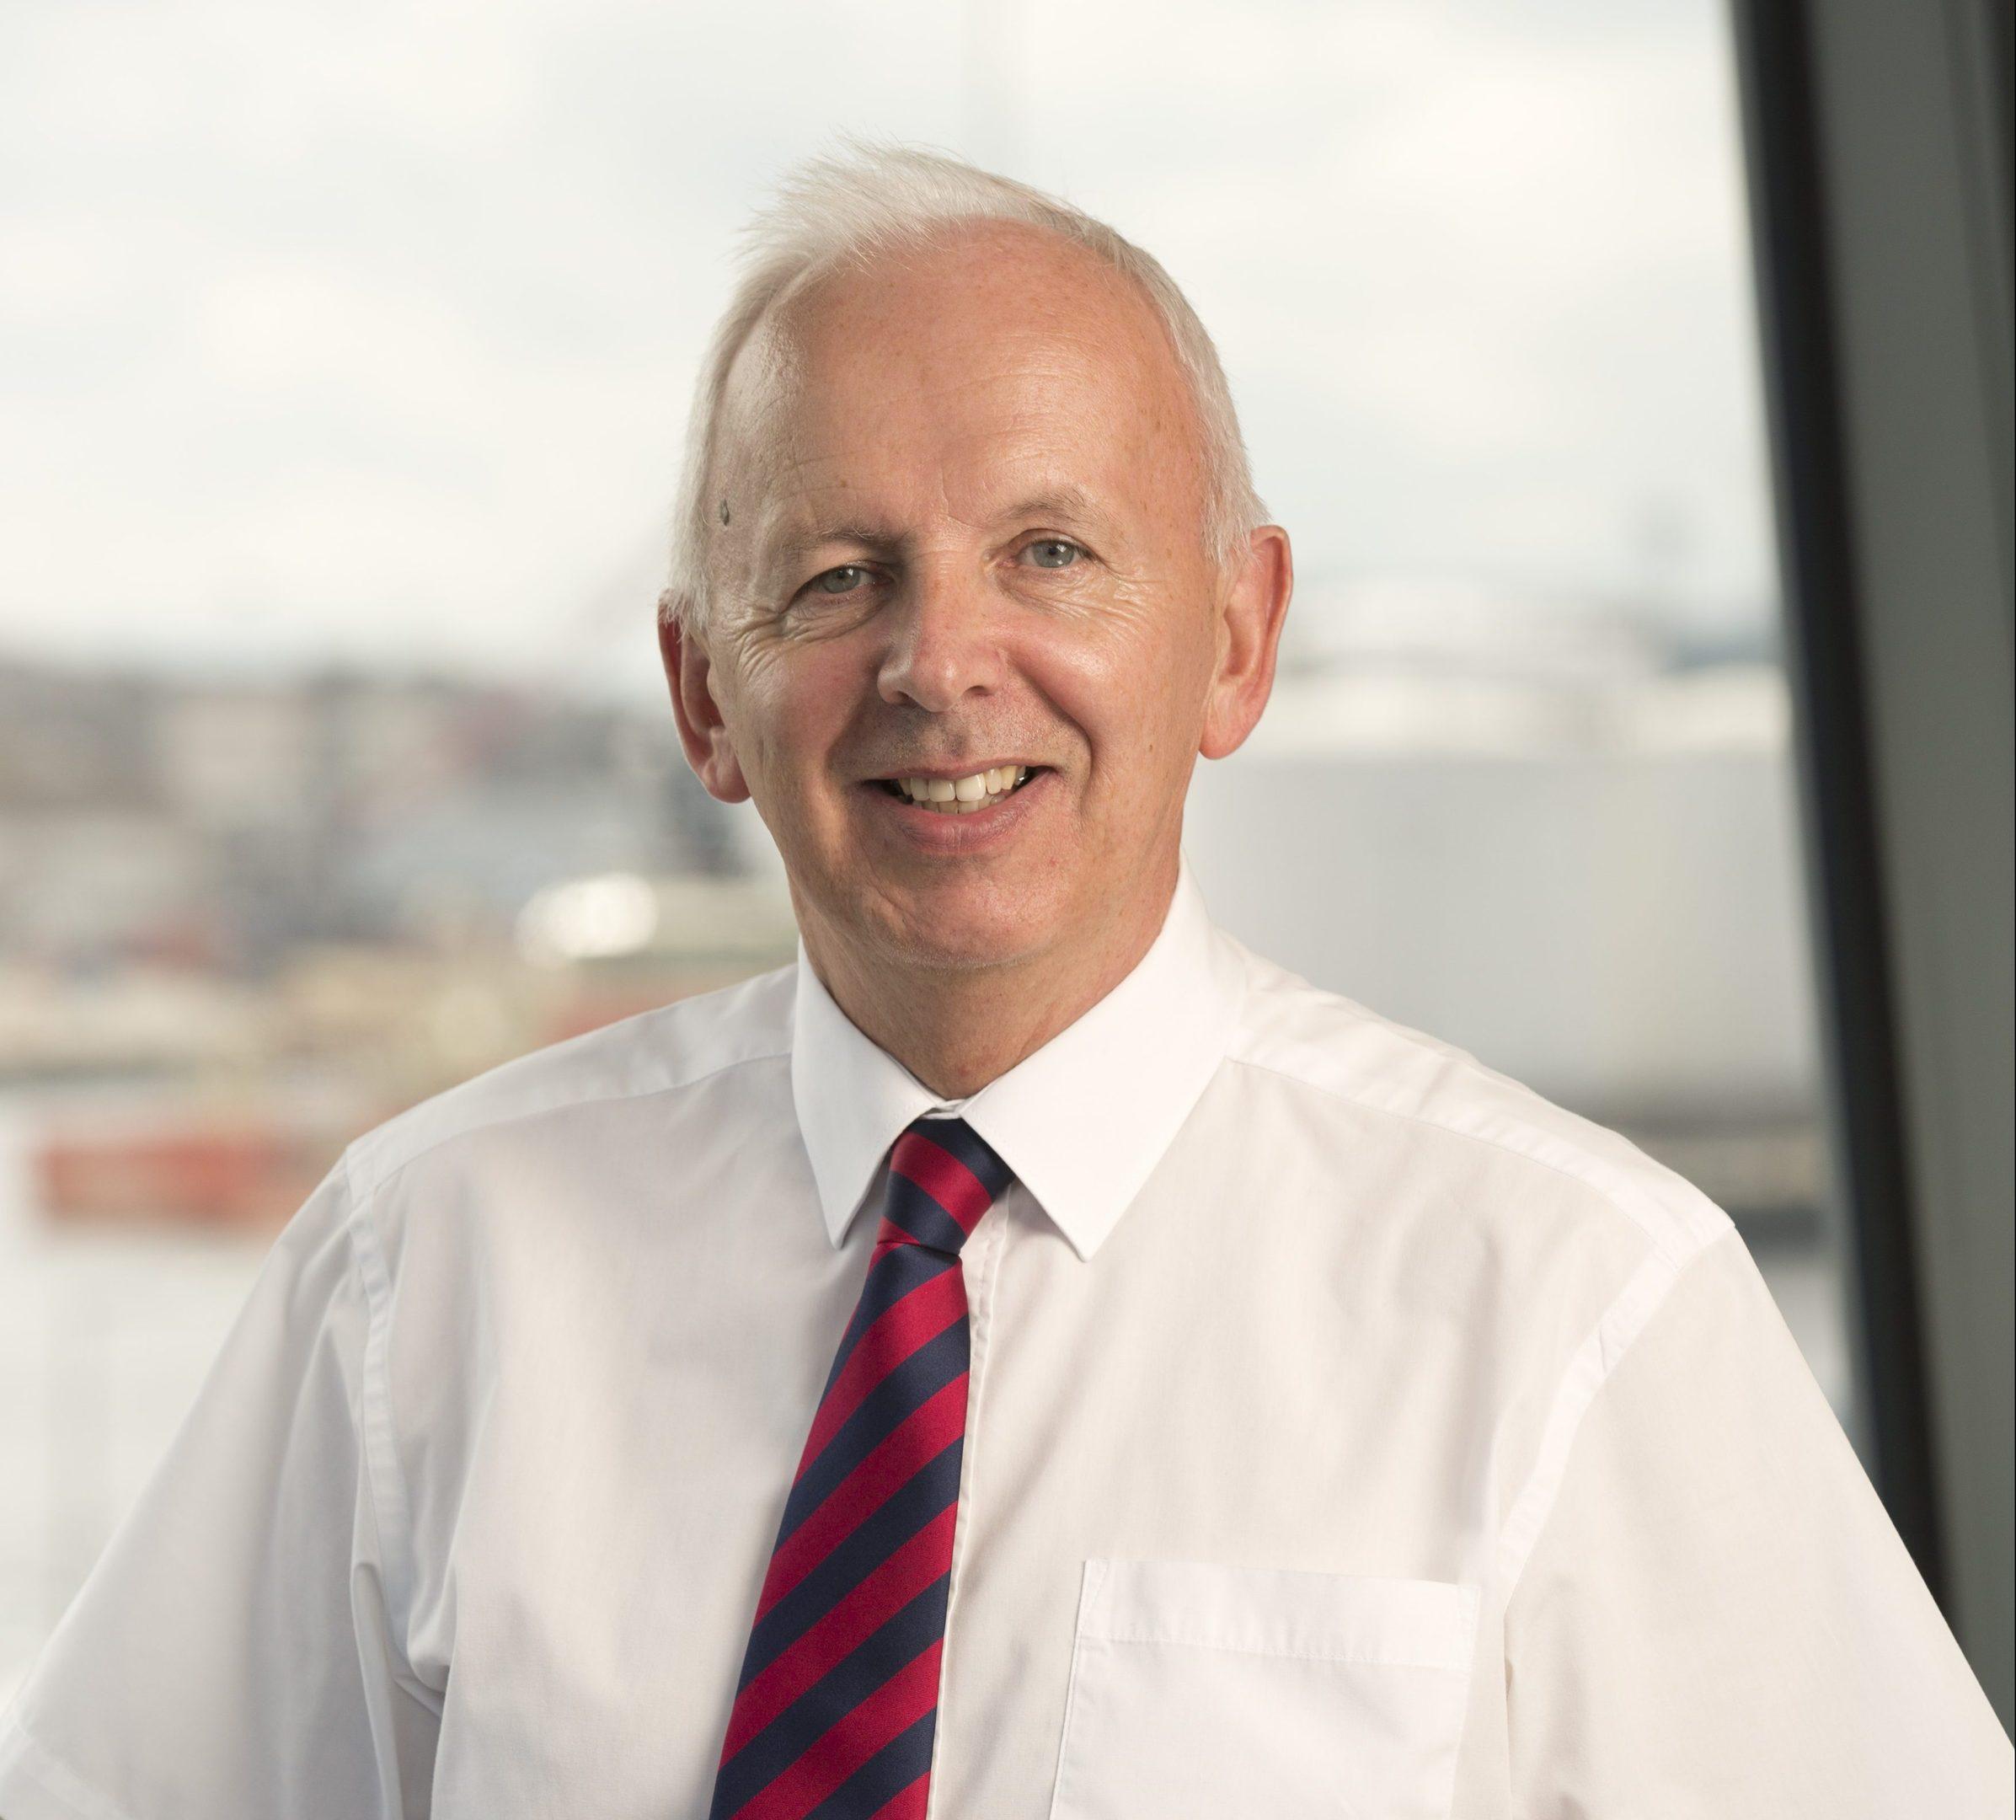 Aberdeen Harbour Board operations manager John McGuigan